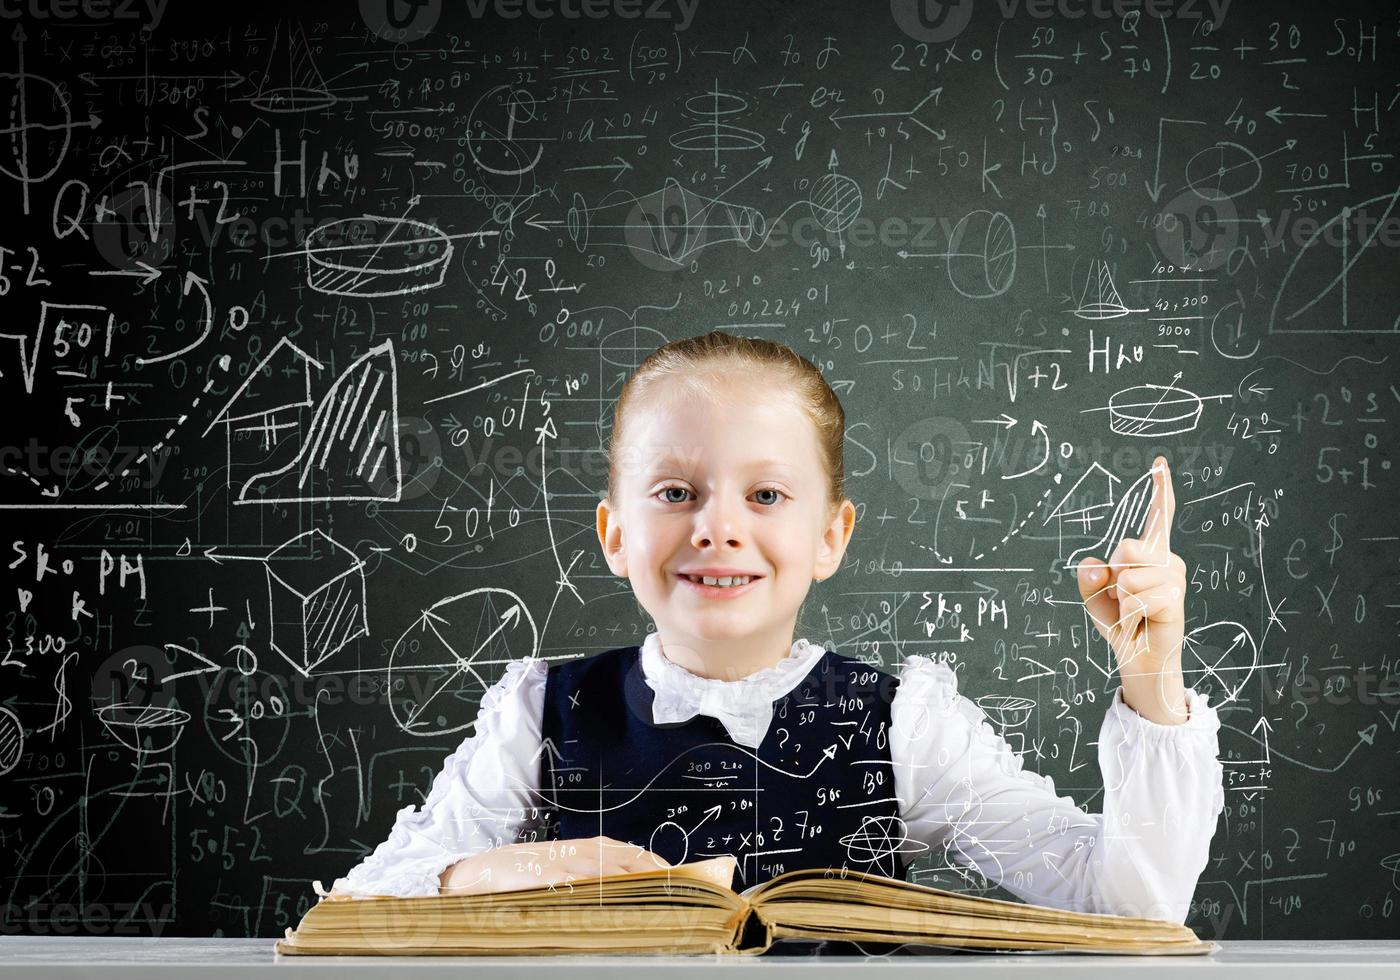 School education photo